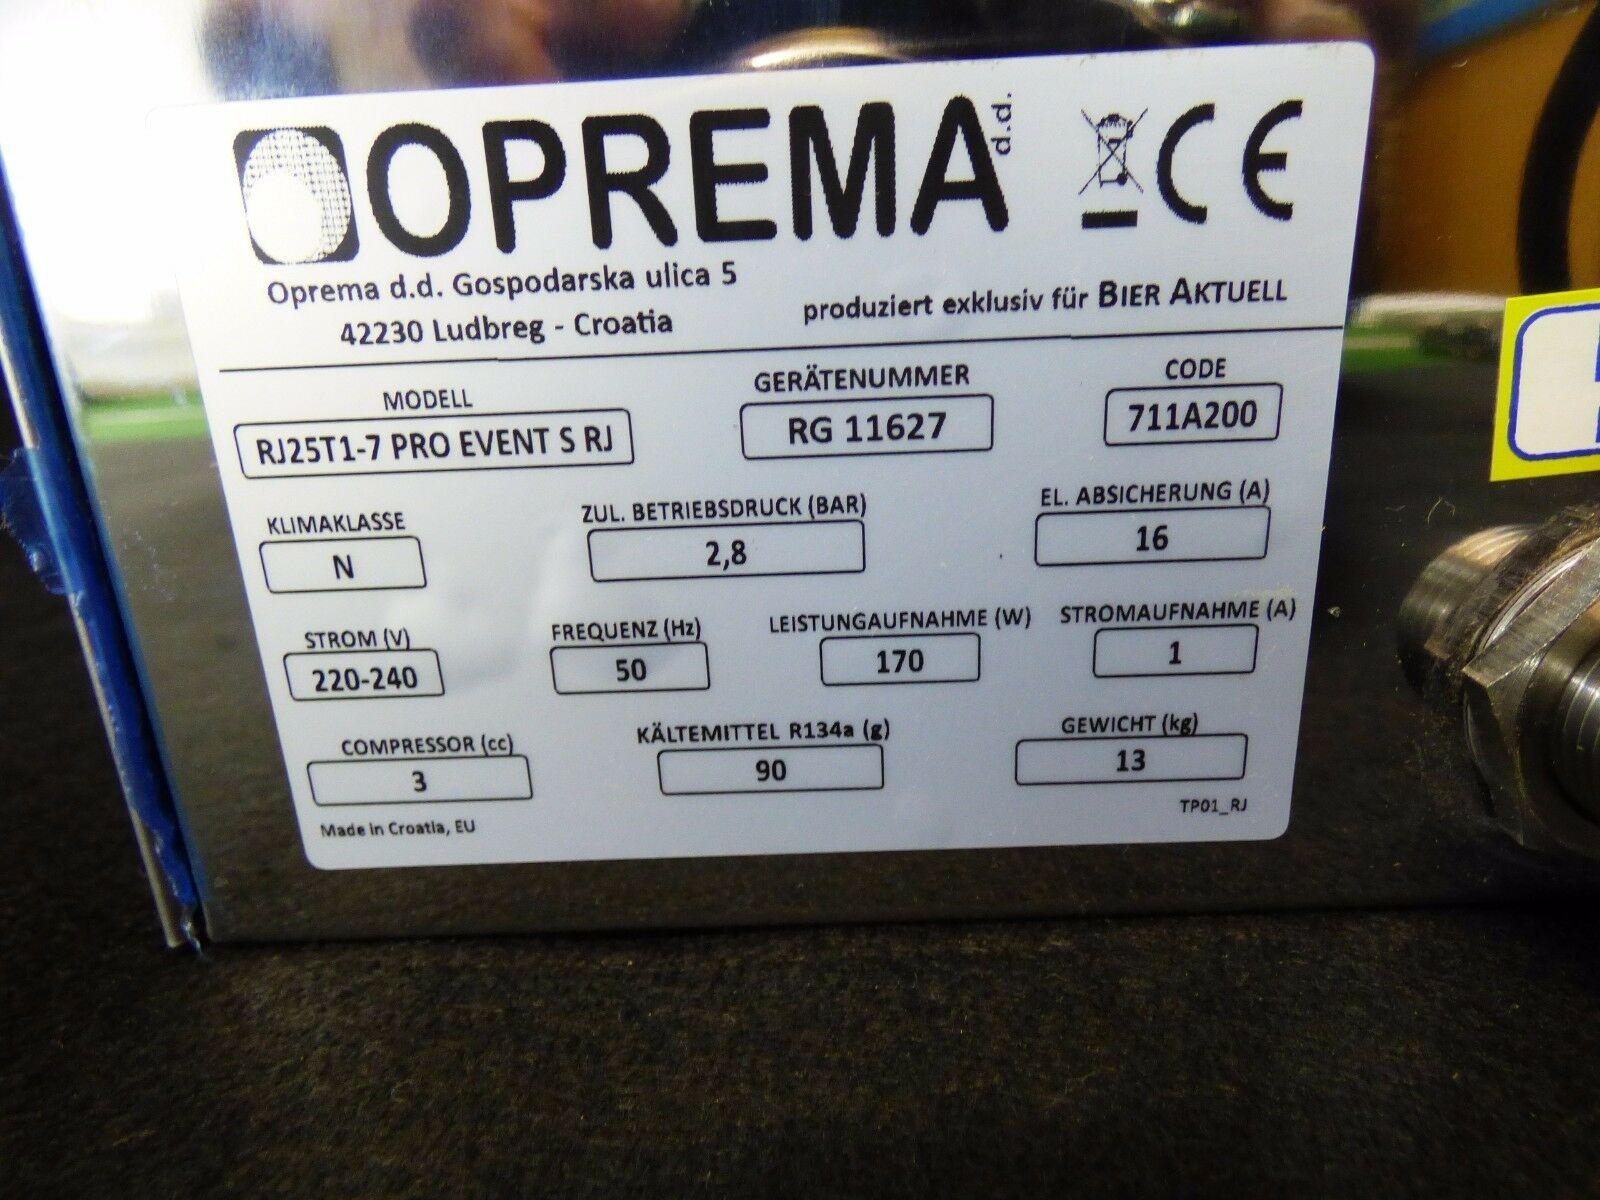 Oprema Zapfanlage Trockenkühler Bierkühler Unterthekenkühlgerät + Zapfsäule